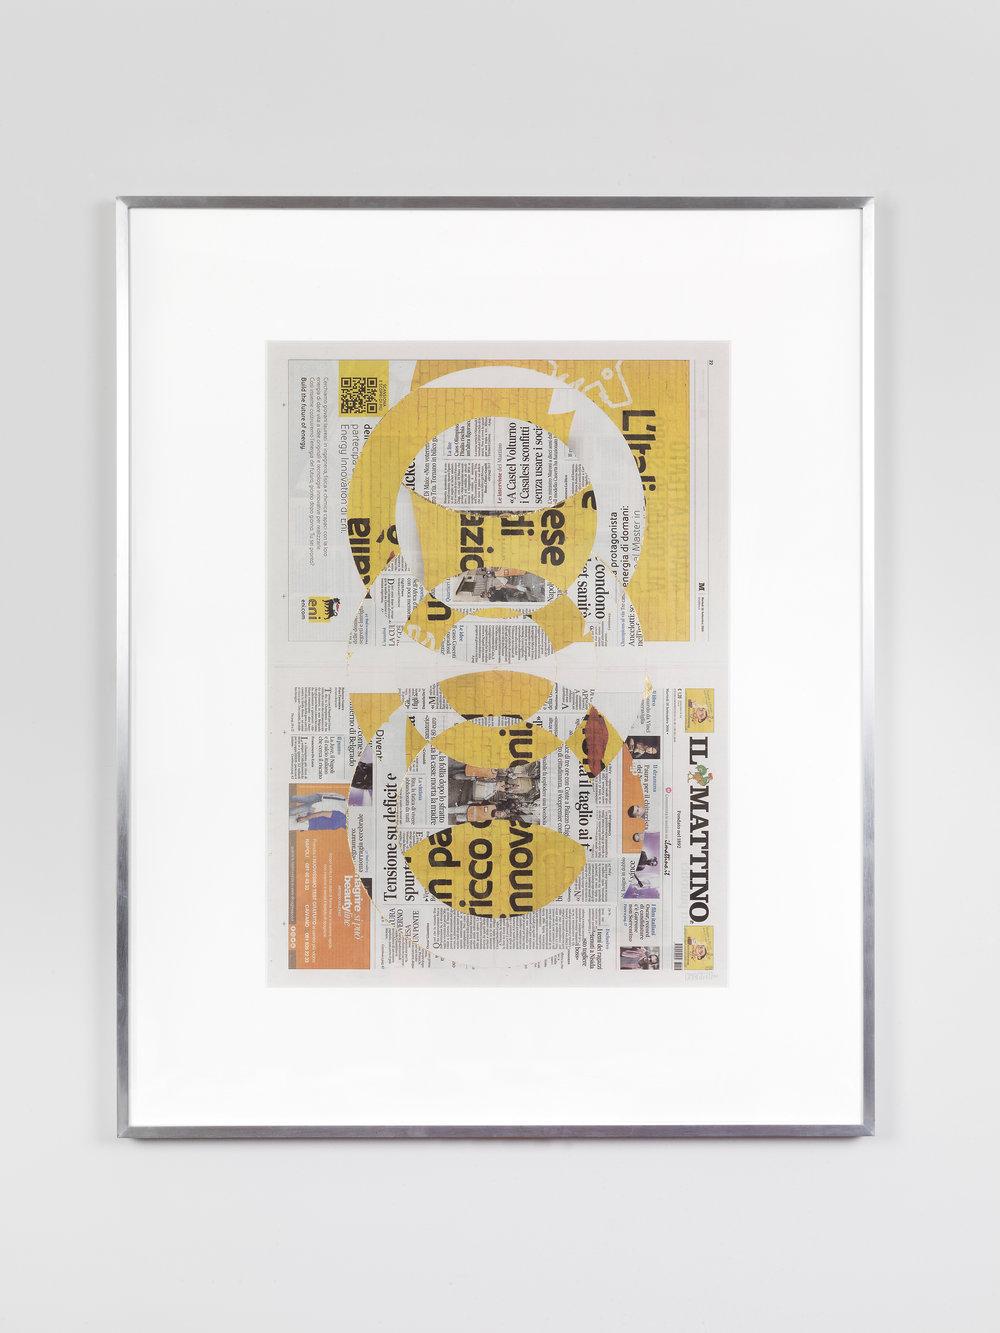 Il Mattino, Martedi 18 Settembre 2018    2018   Newspaper, tape, and 22 karat gold leaf  39 3/8 x 31 1/2 inches   Blind Collages, 2017–